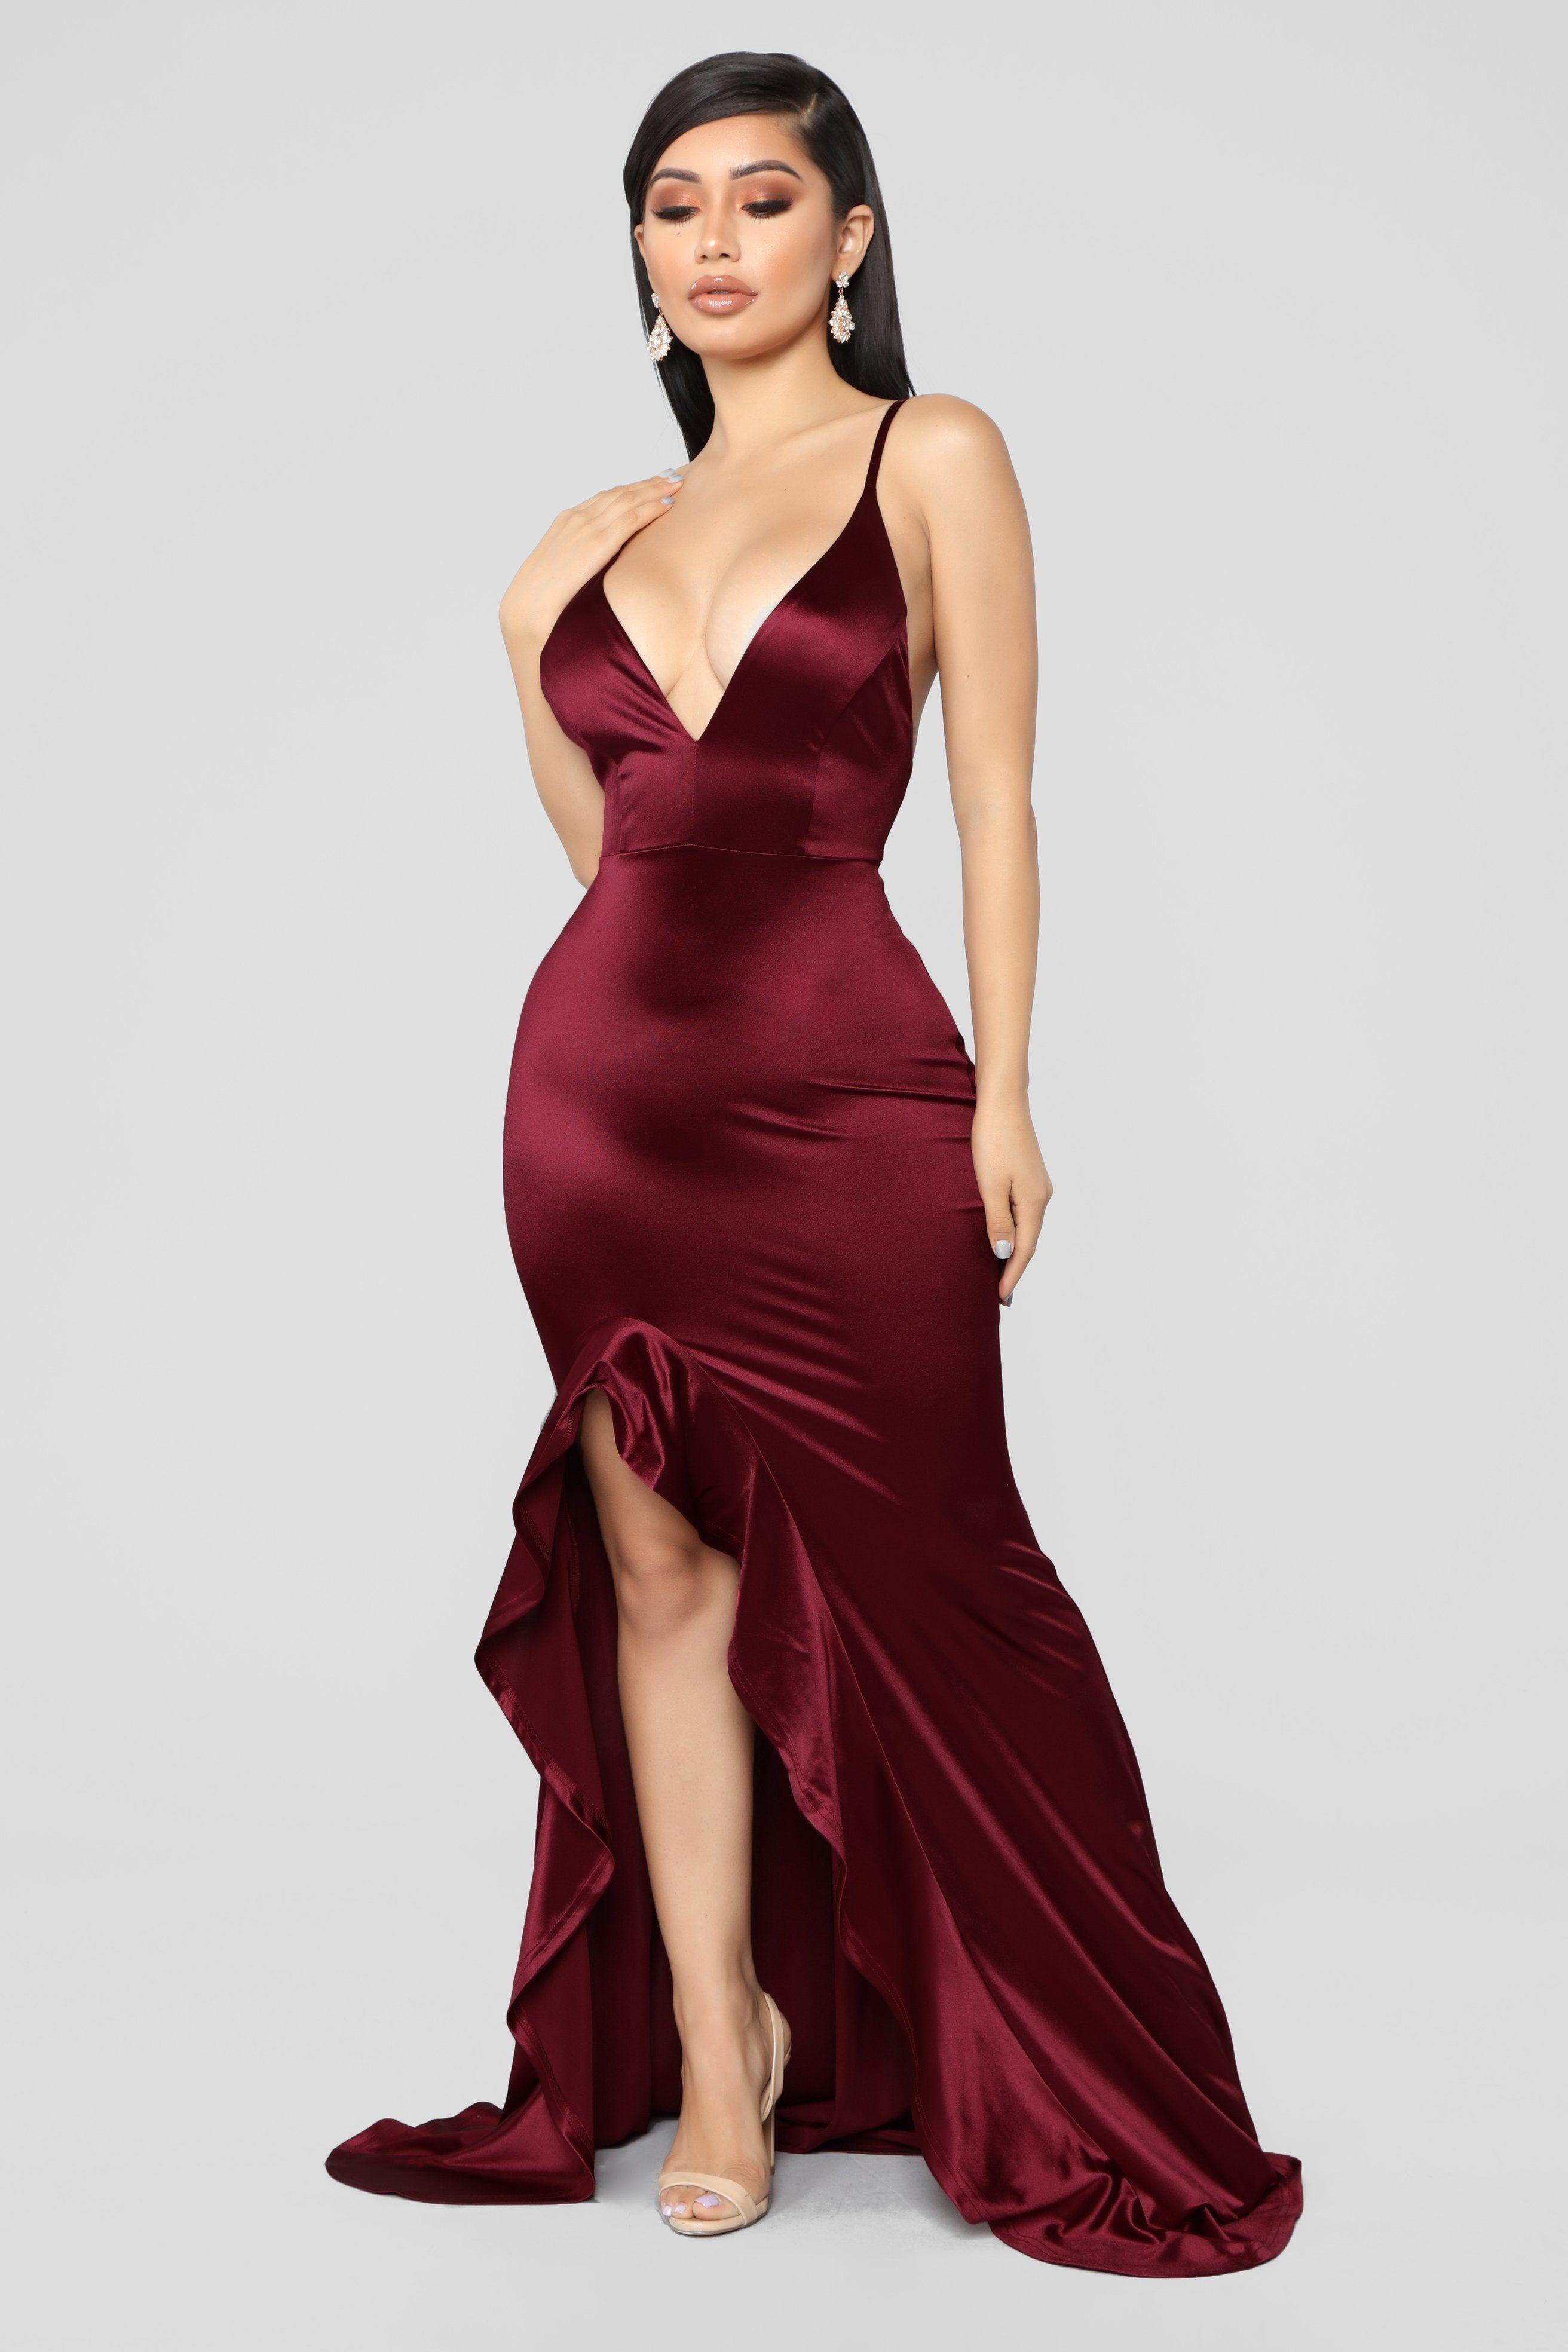 Temporary Love Satin Mermaid Dress Wine Fashion Nova Prom Dresses Satin Mermaid Dress Fashion Nova Dress [ 3936 x 2624 Pixel ]